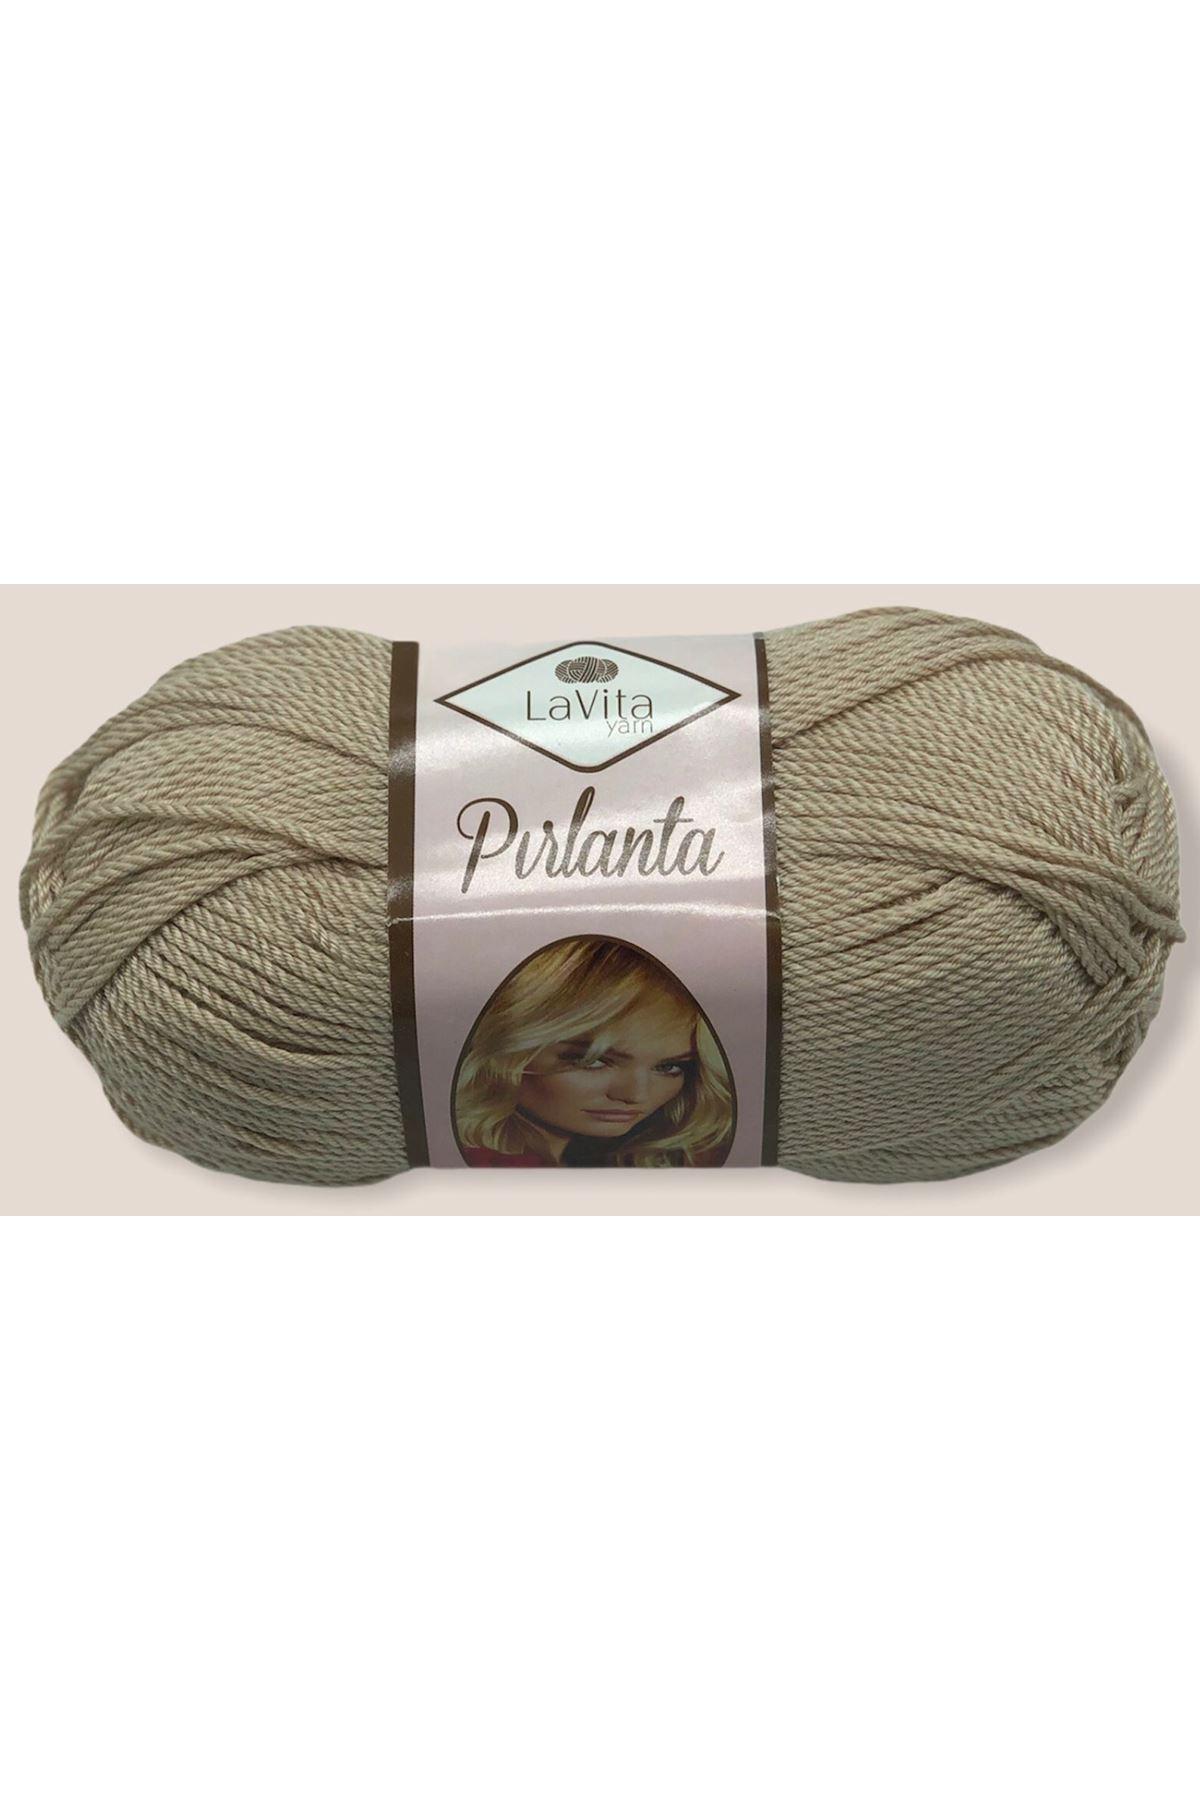 Lavita Pırlanta - 1036 Cappucino